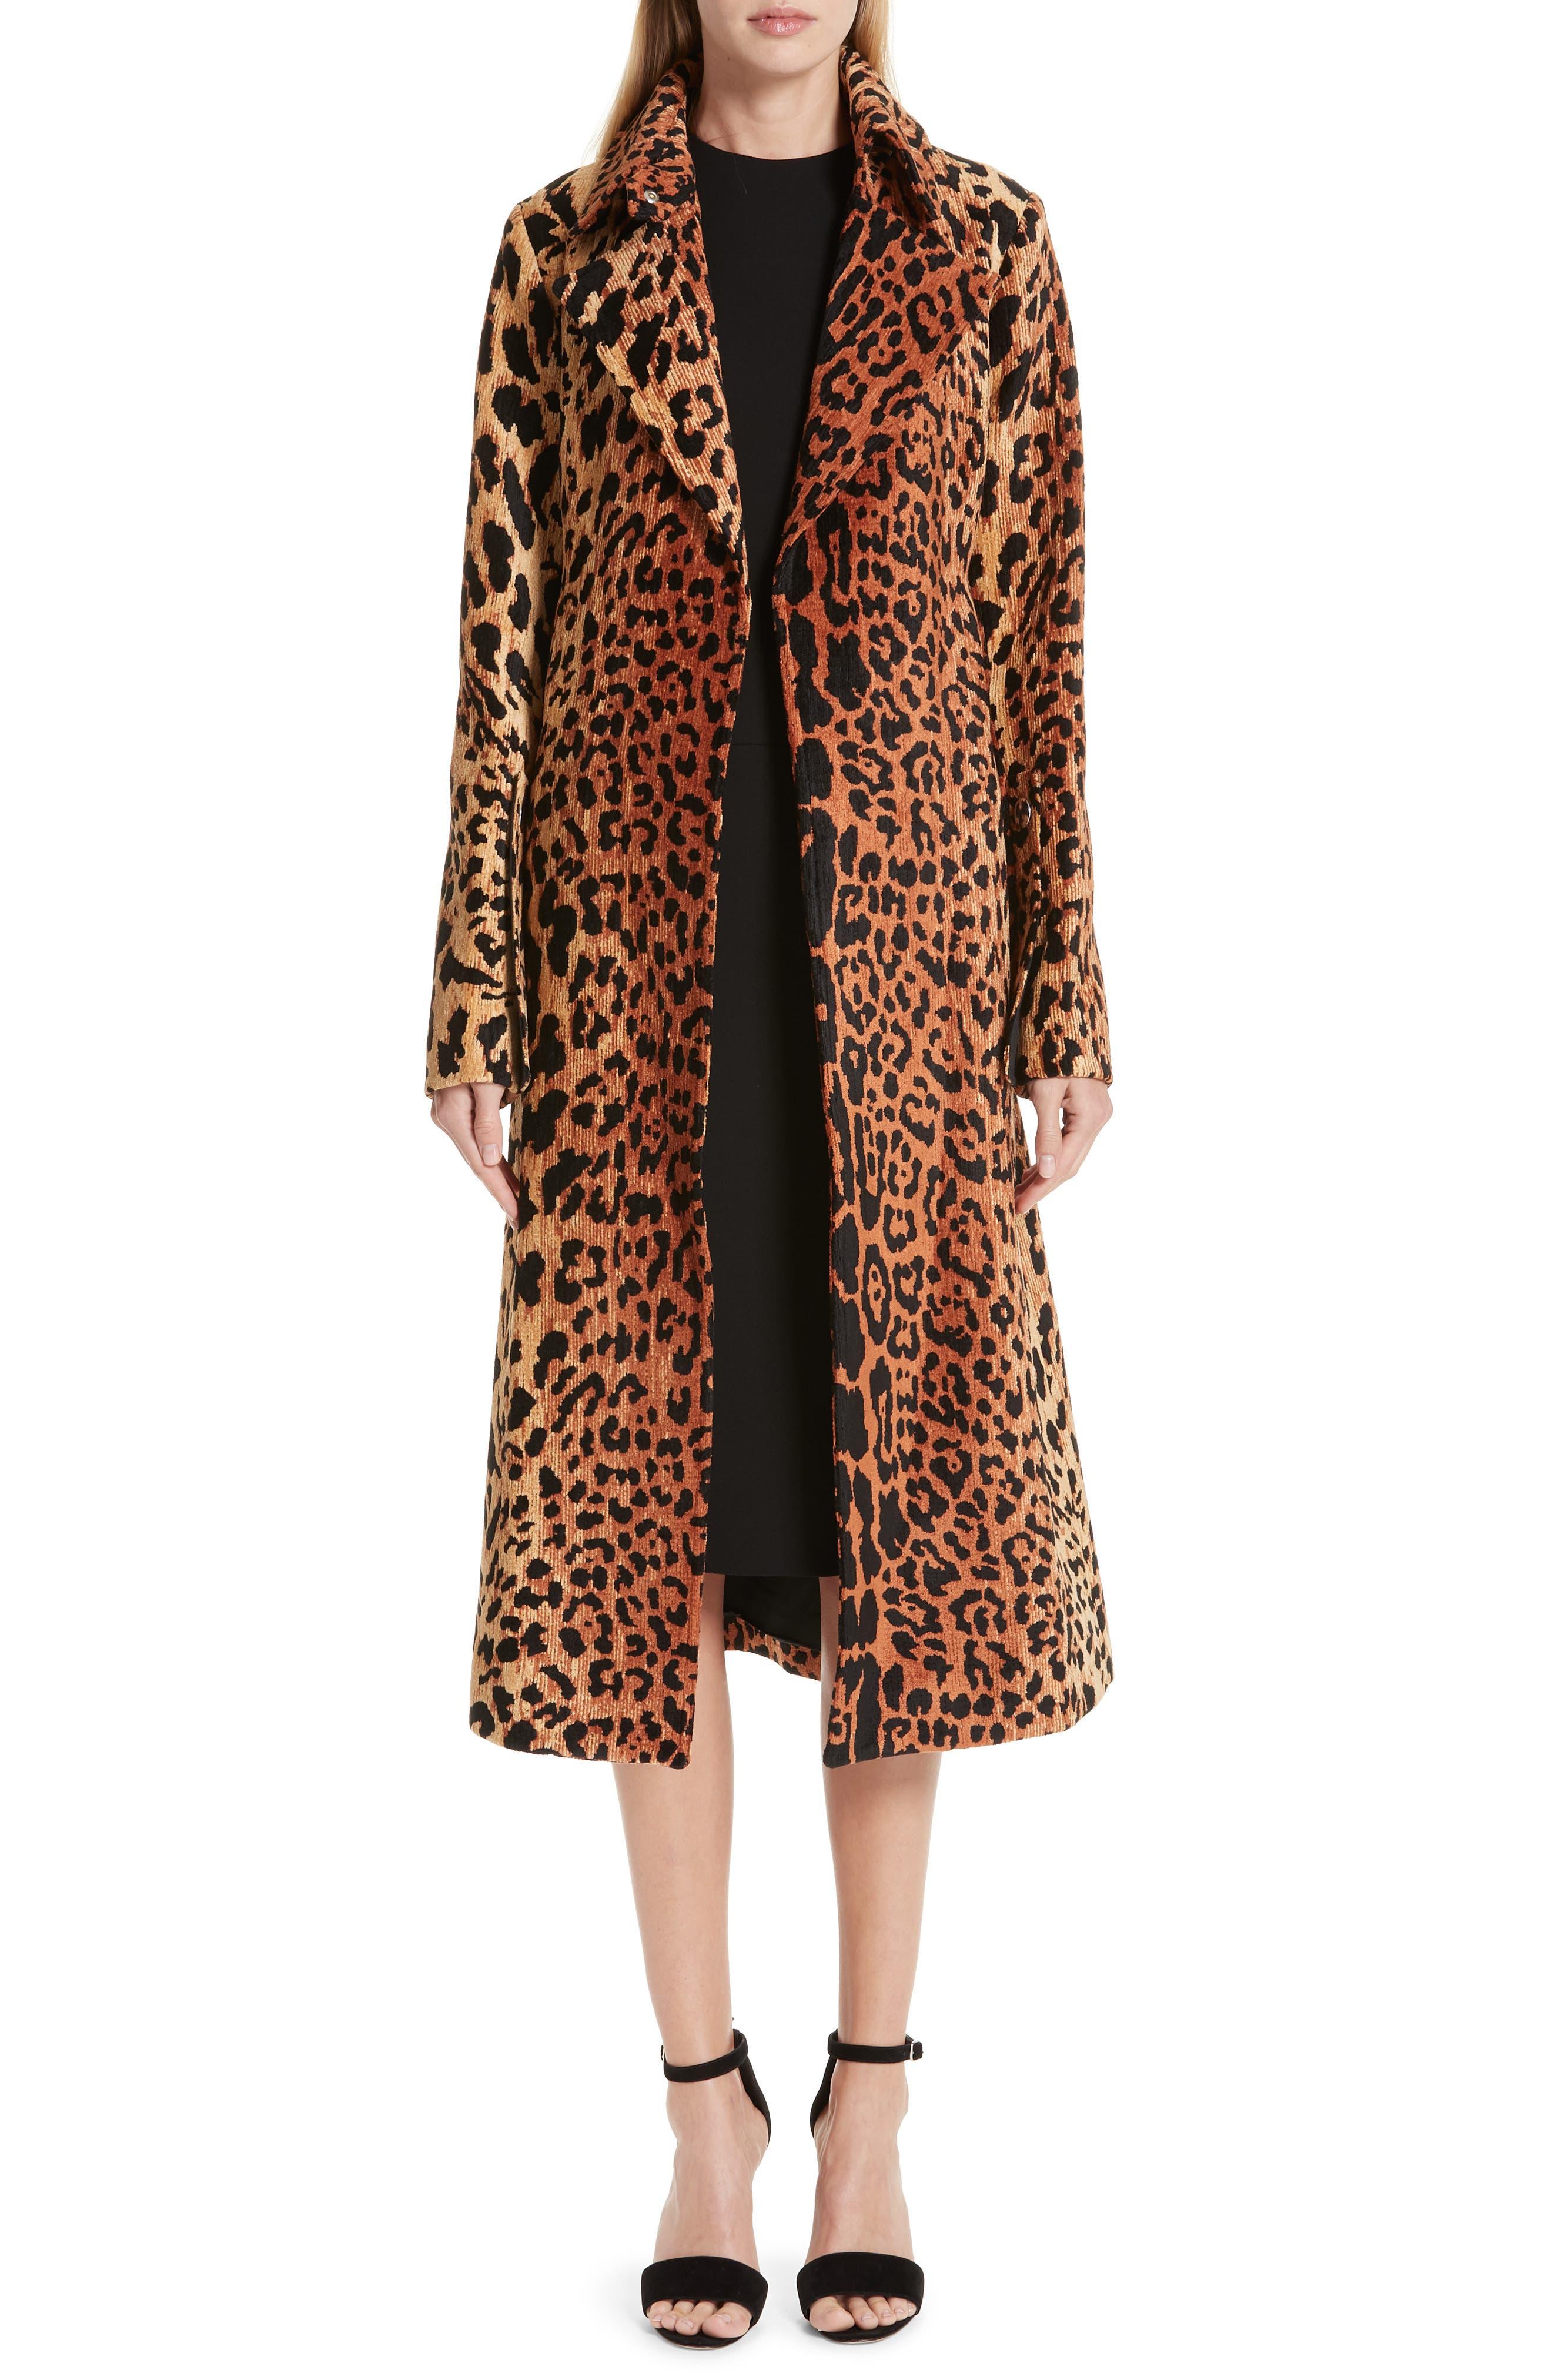 VICTORIA BECKHAM, Back Zip Body-Con Dress, Alternate thumbnail 8, color, BLACK